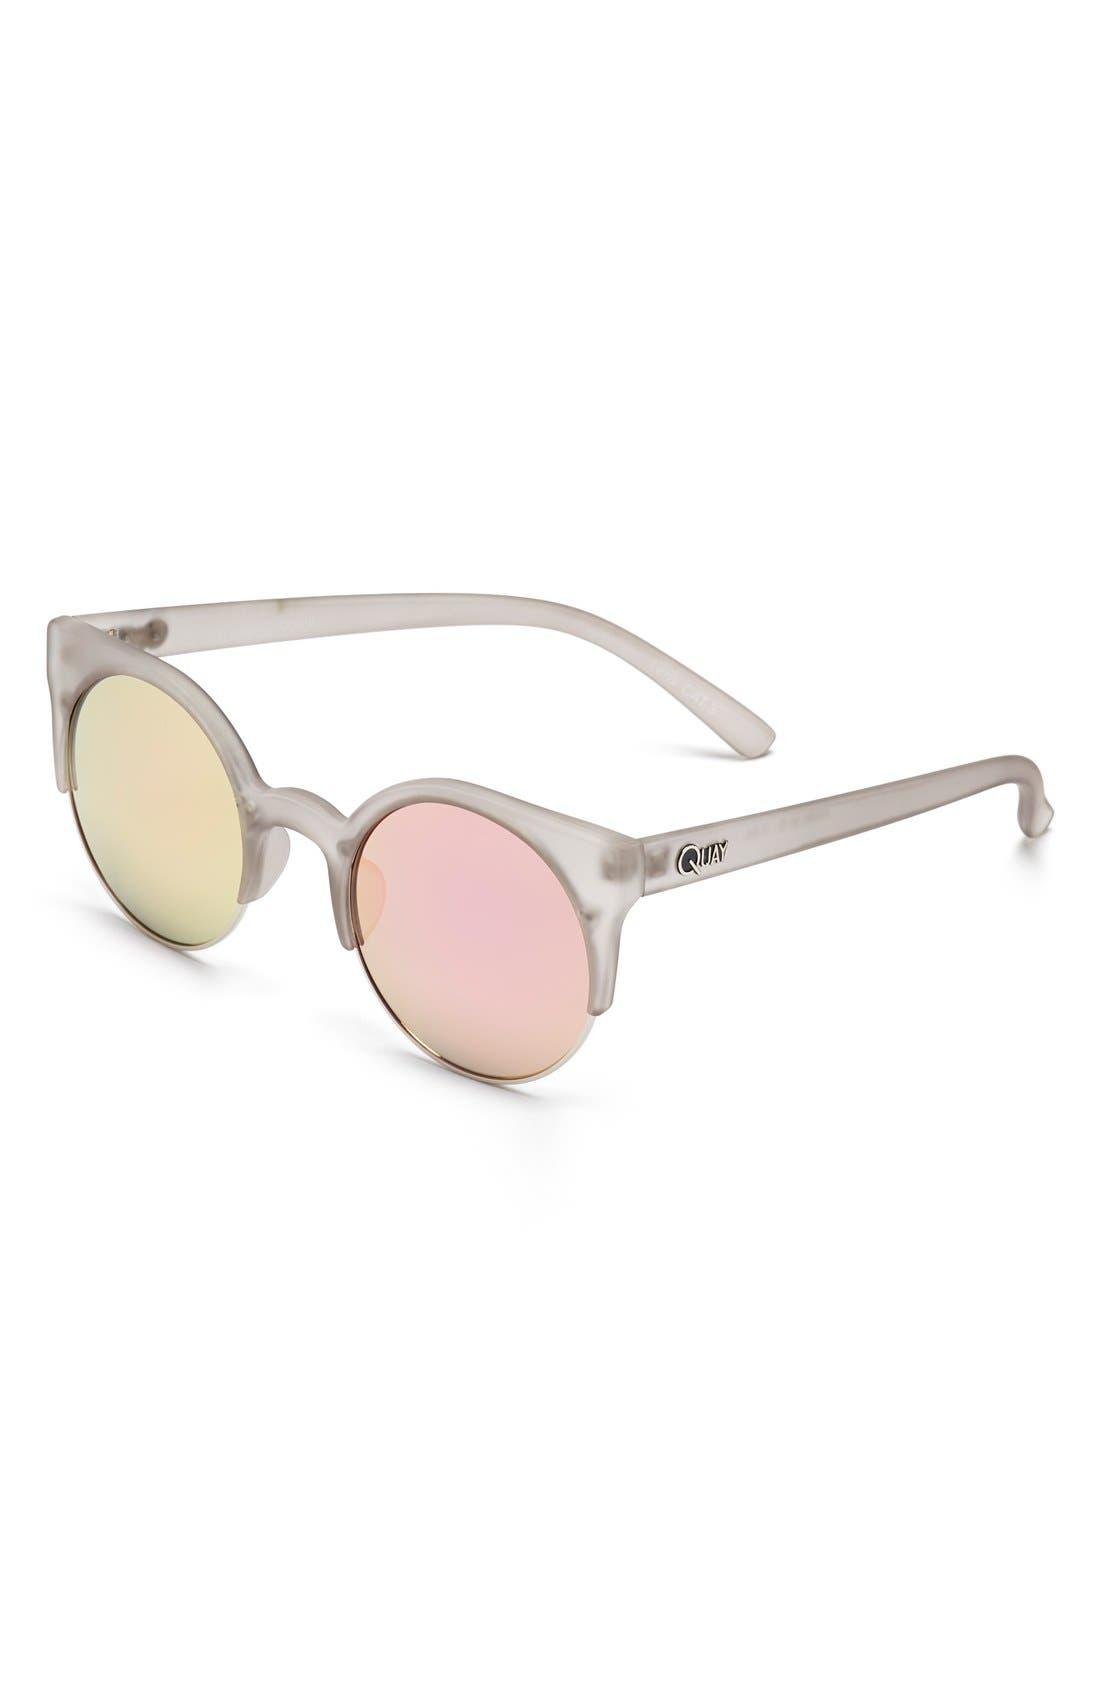 Alternate Image 1 Selected - Quay Australia 'Harlm' 50mm Sunglasses